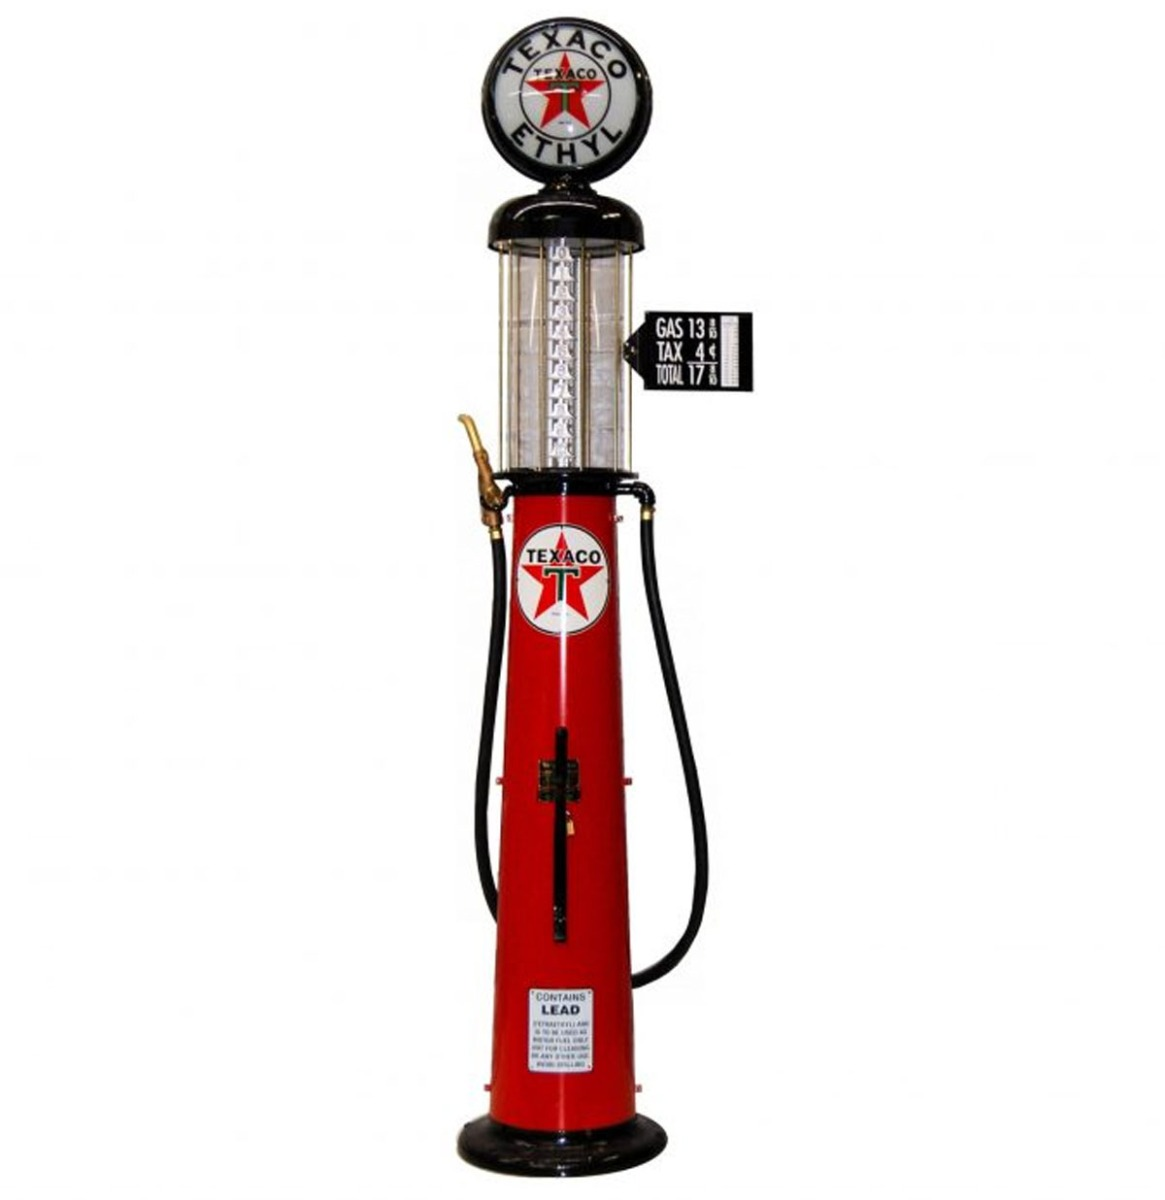 Wayne 615 Texaco Ethyl 10 Gallon Benzinepomp - Rood & Zwart - Reproductie